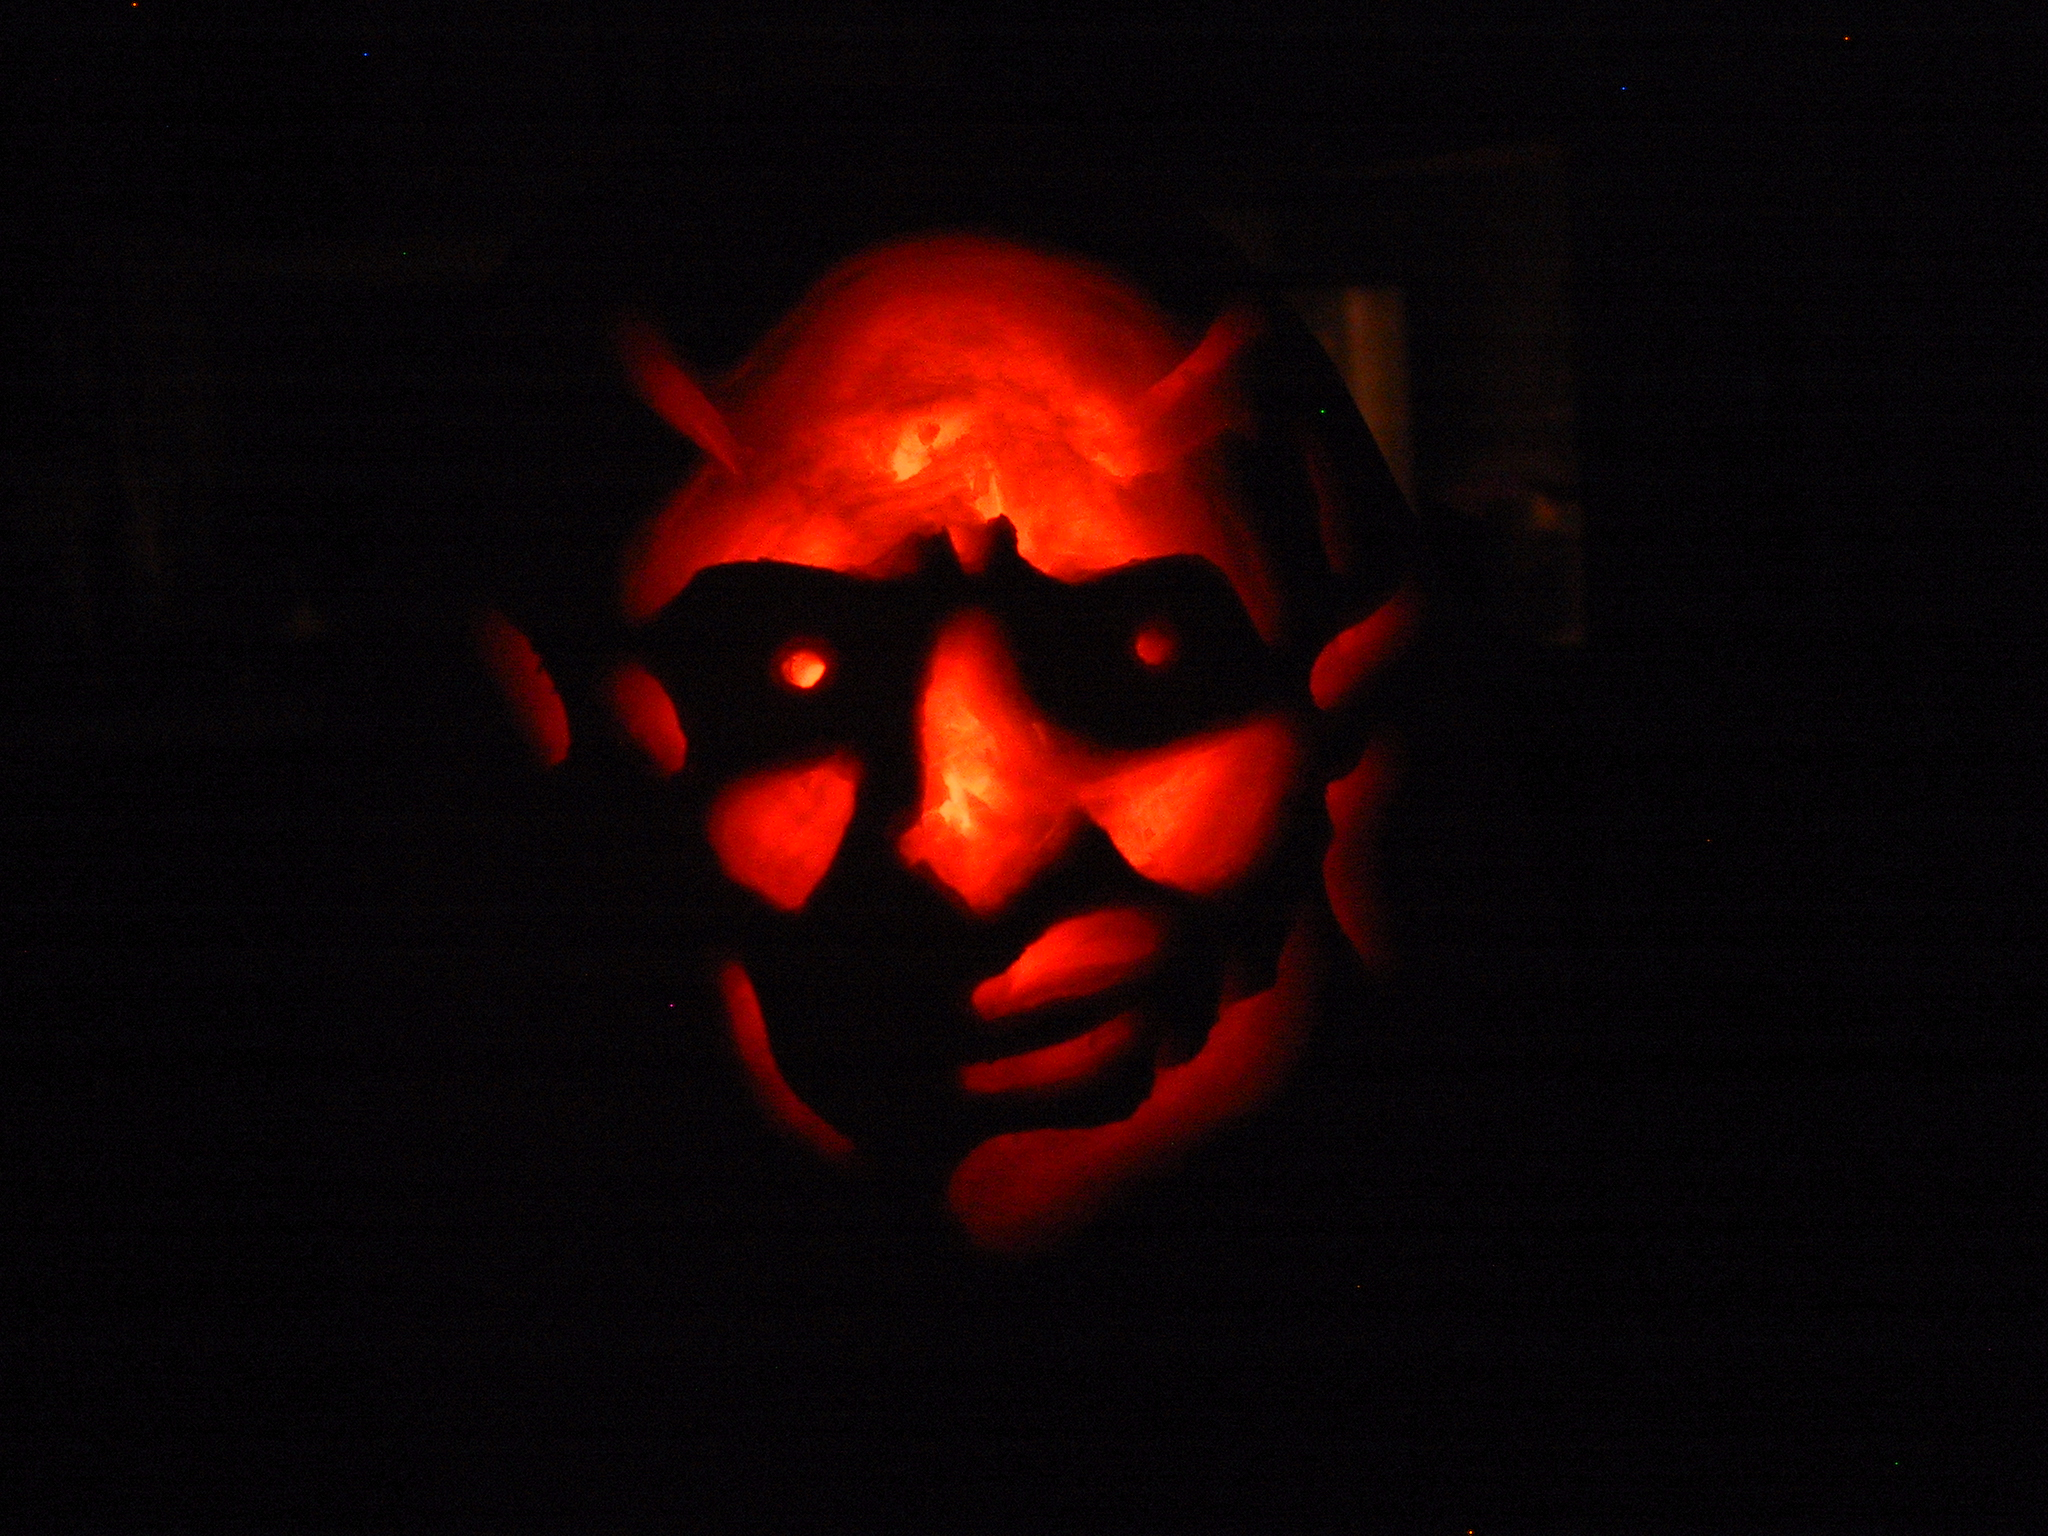 barb painting devil red dark evil